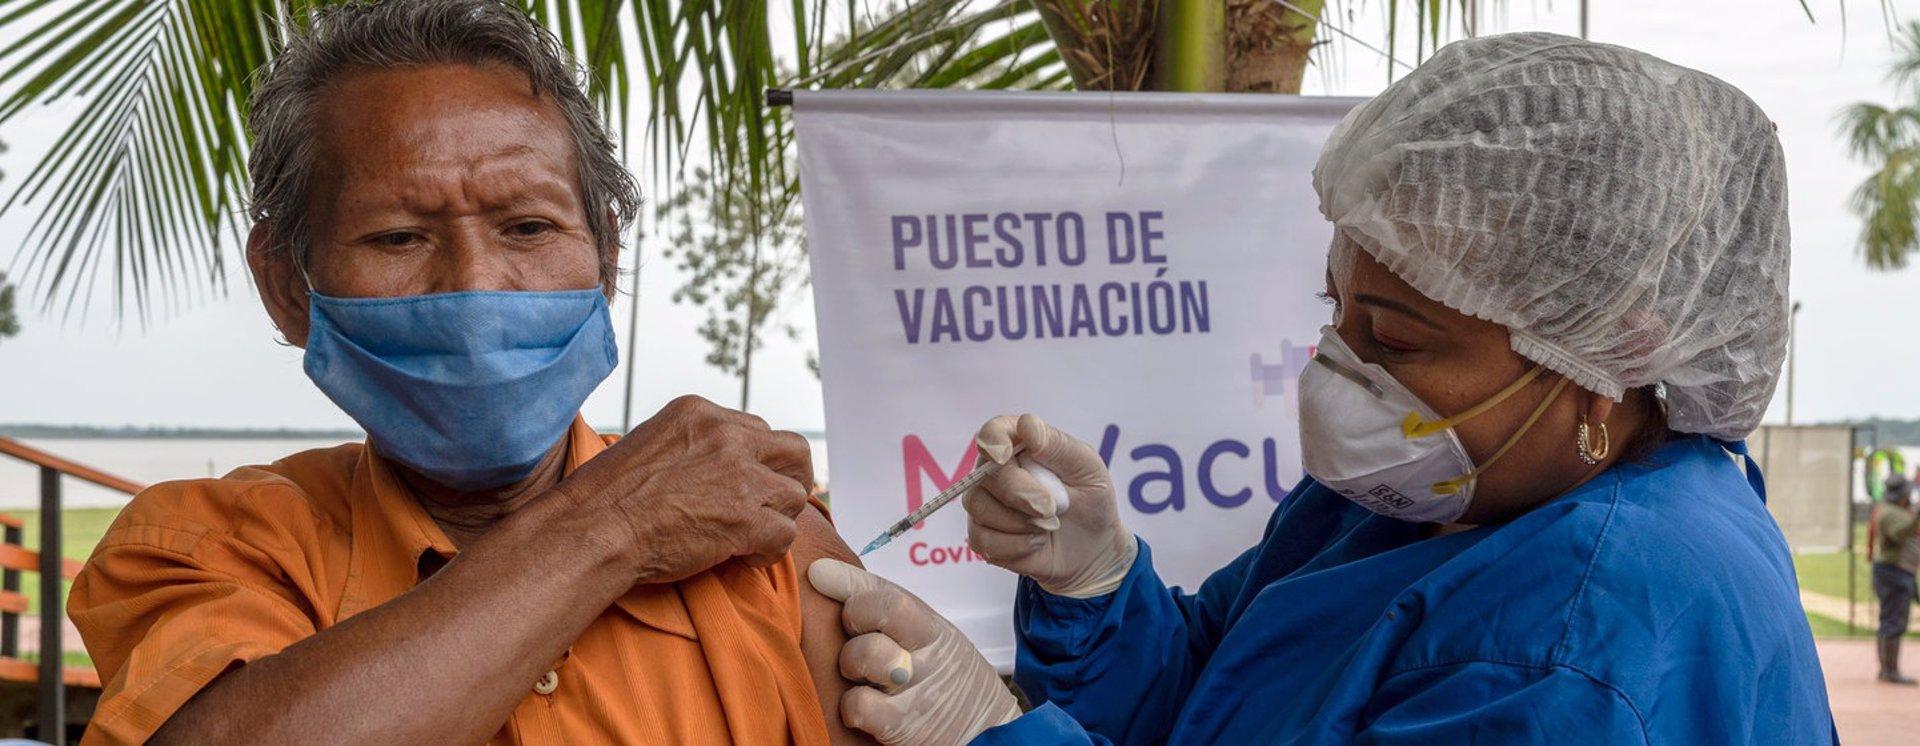 Vacunació contra la Covid als pobles indígenes de l'Amazones | EP